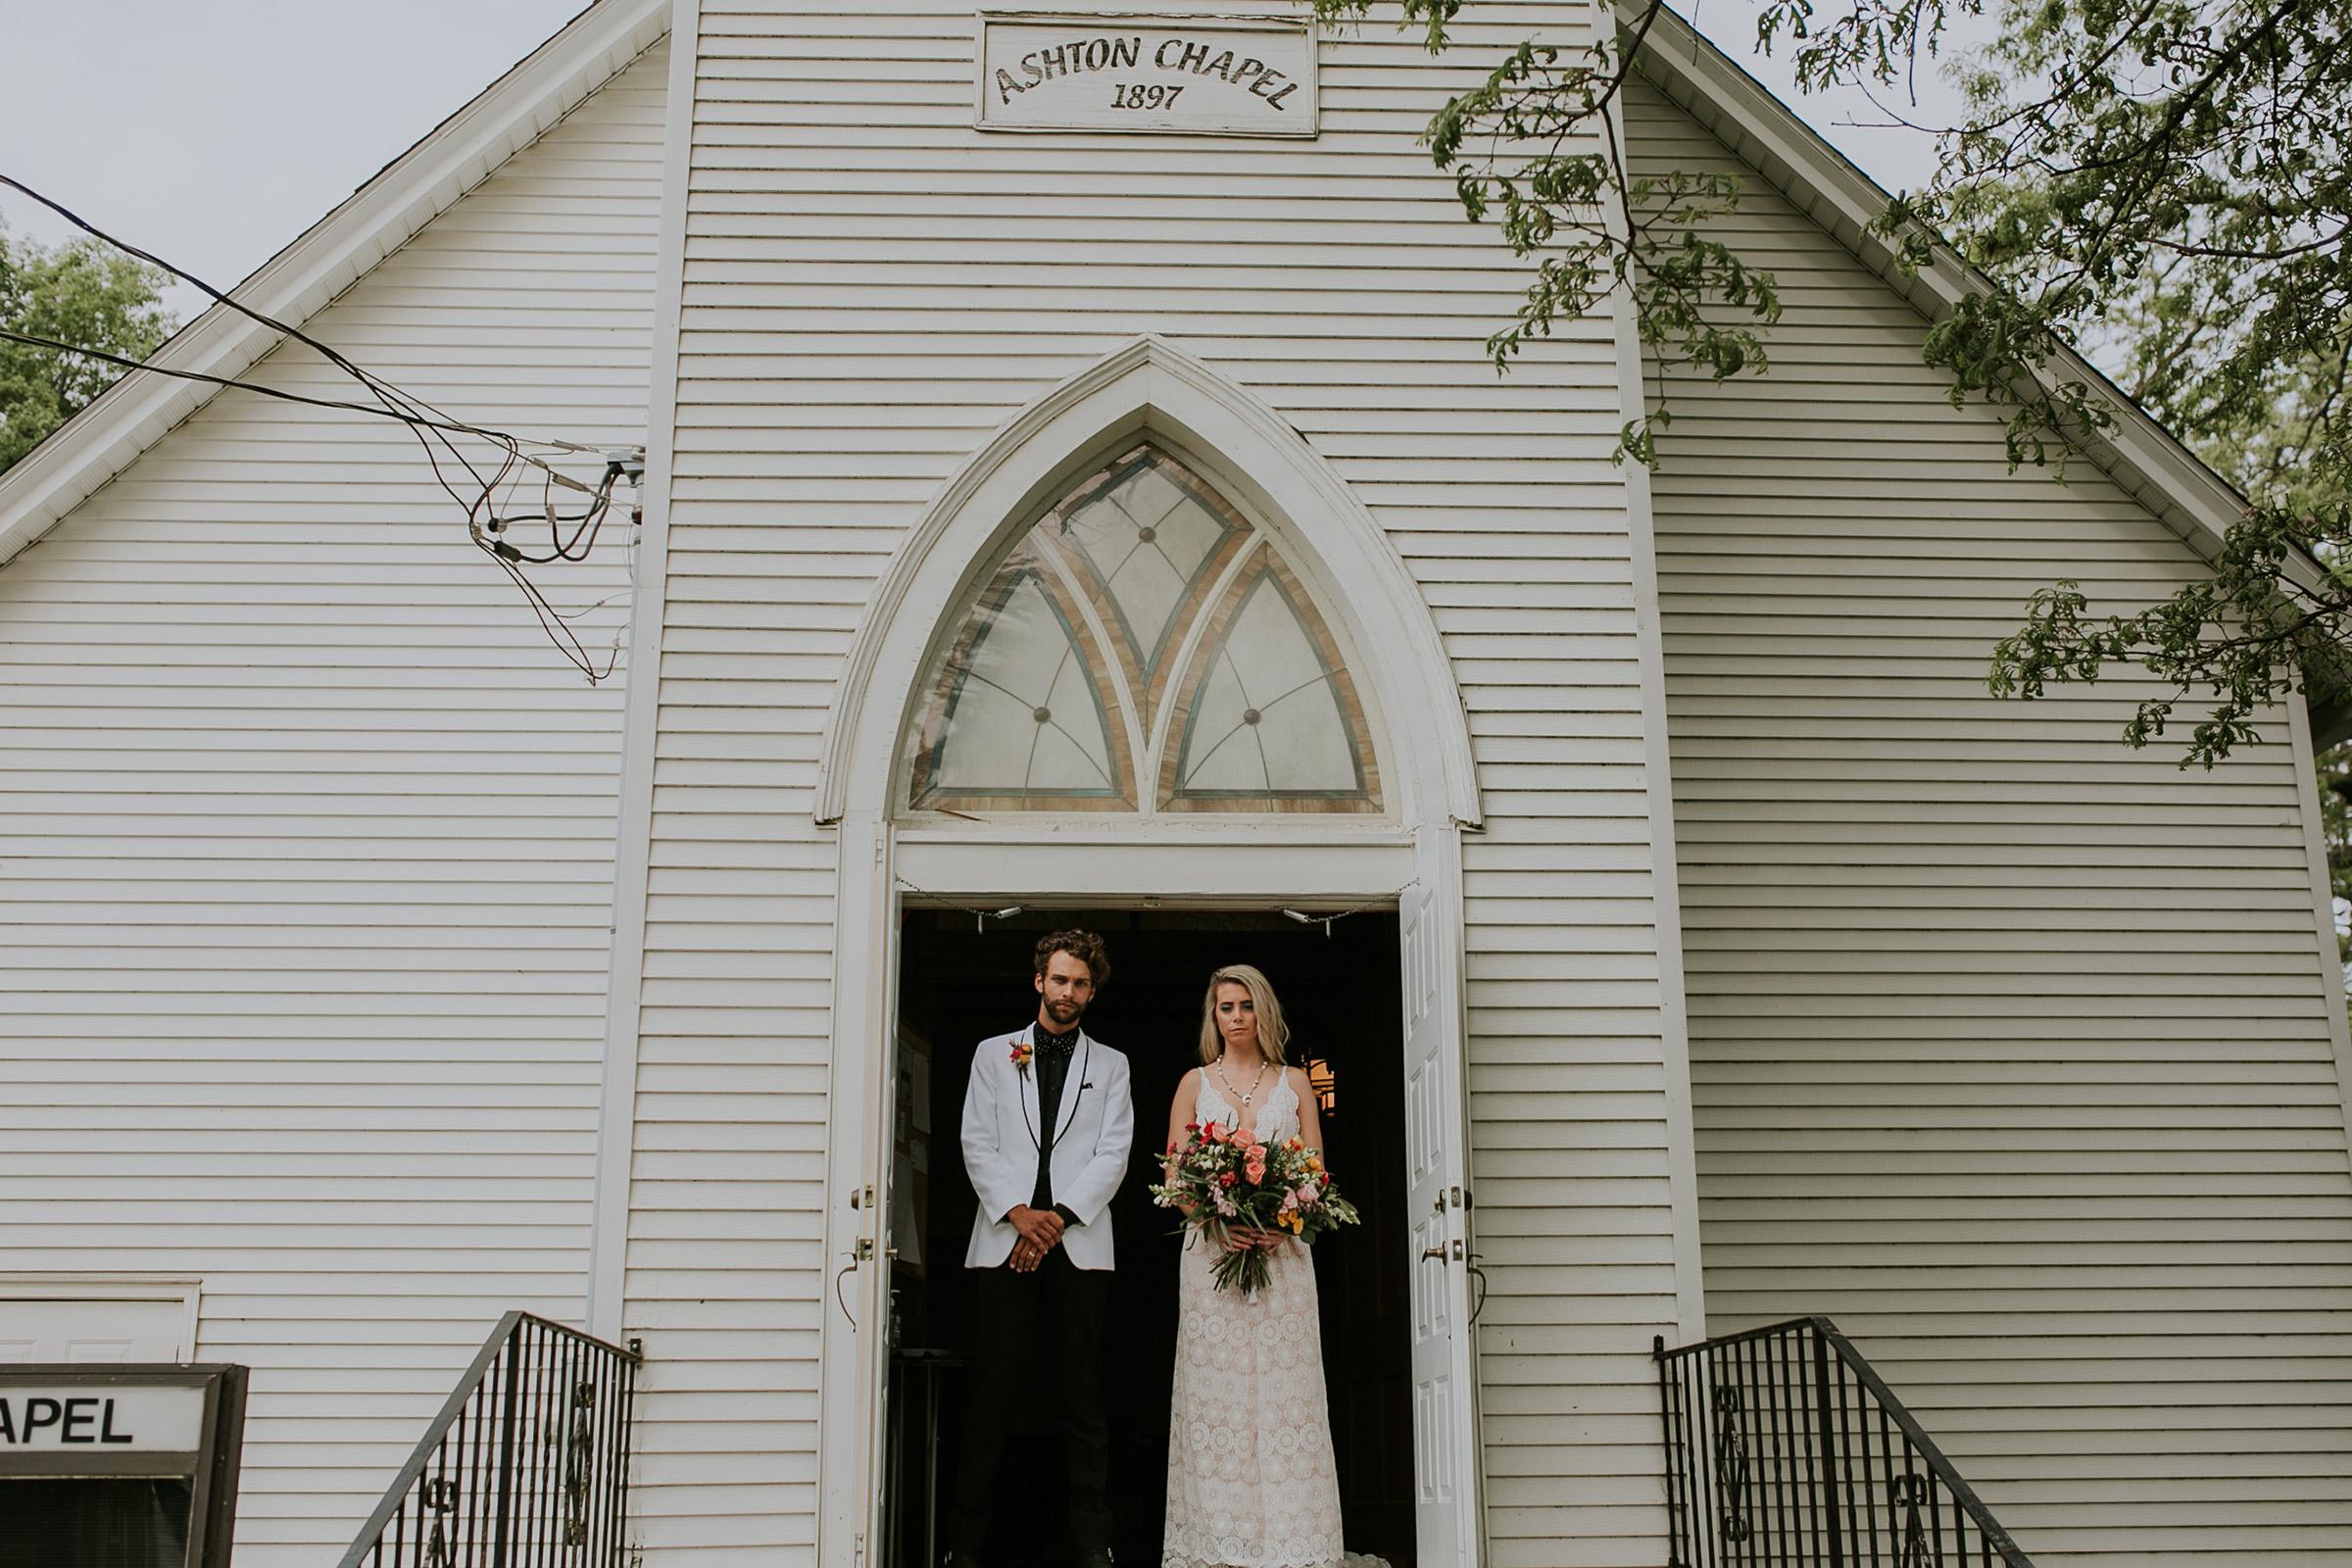 bride-and-groom-ashton-hill-iowa-road-trip-romance-wedding-raelyn-ramey-photography-4.jpg